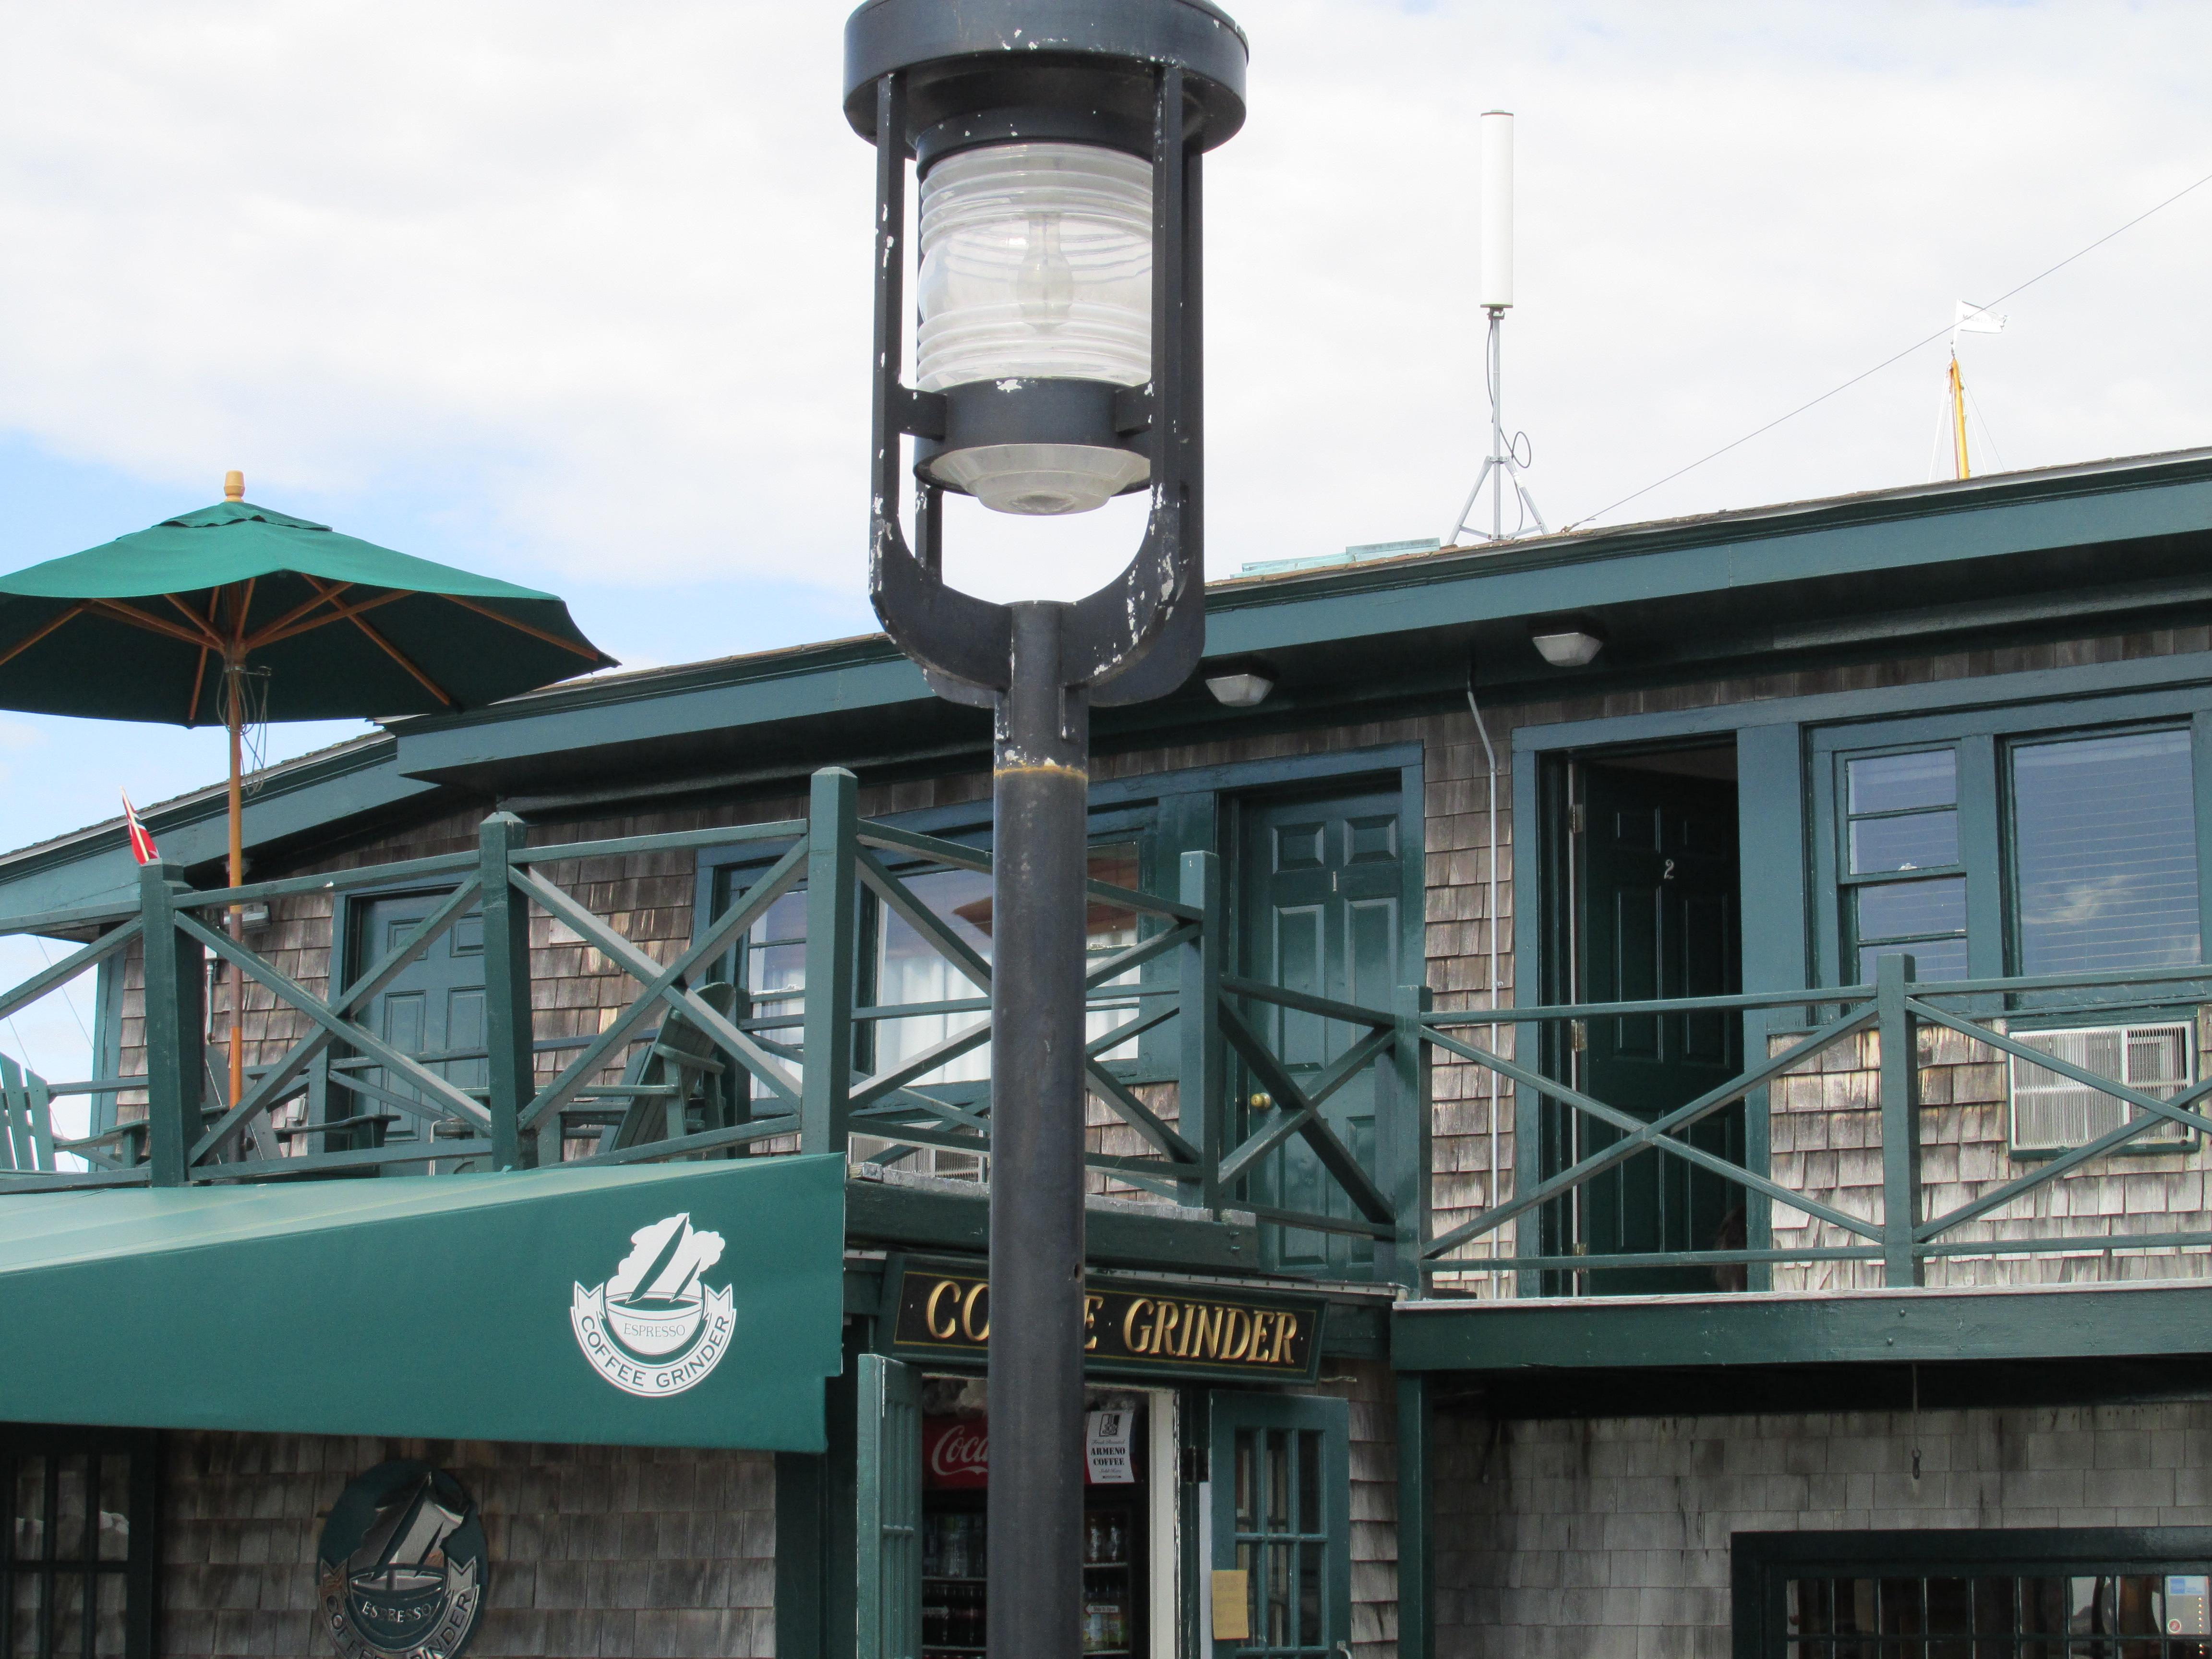 Newport-Bannisters-Wharf-accommodations.jpg